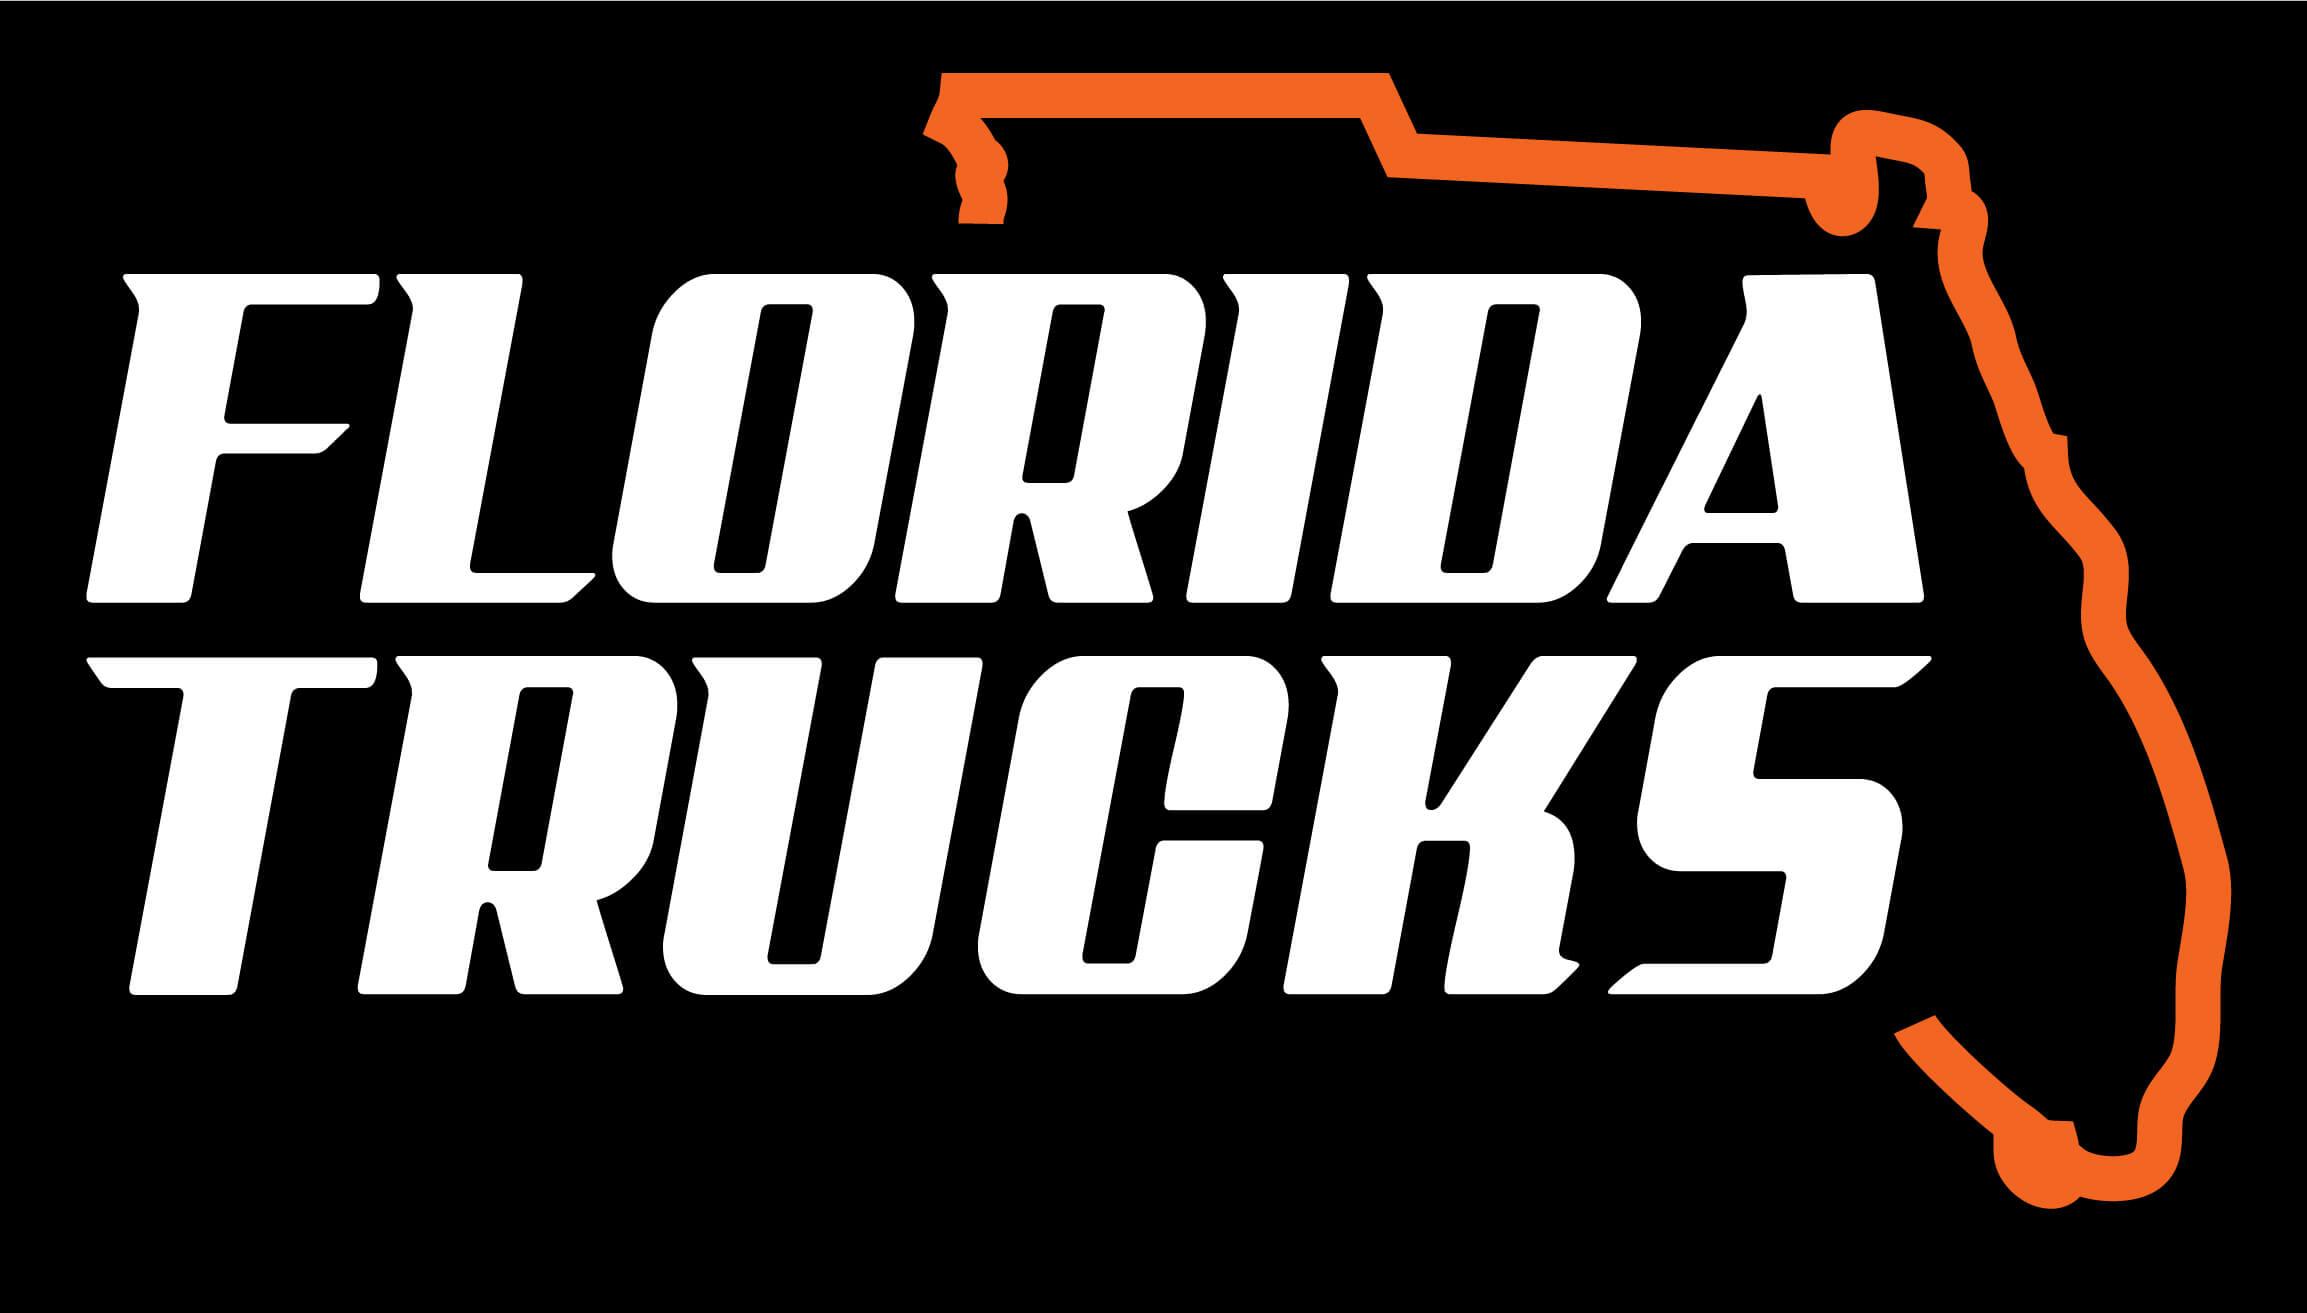 Florida Trucks